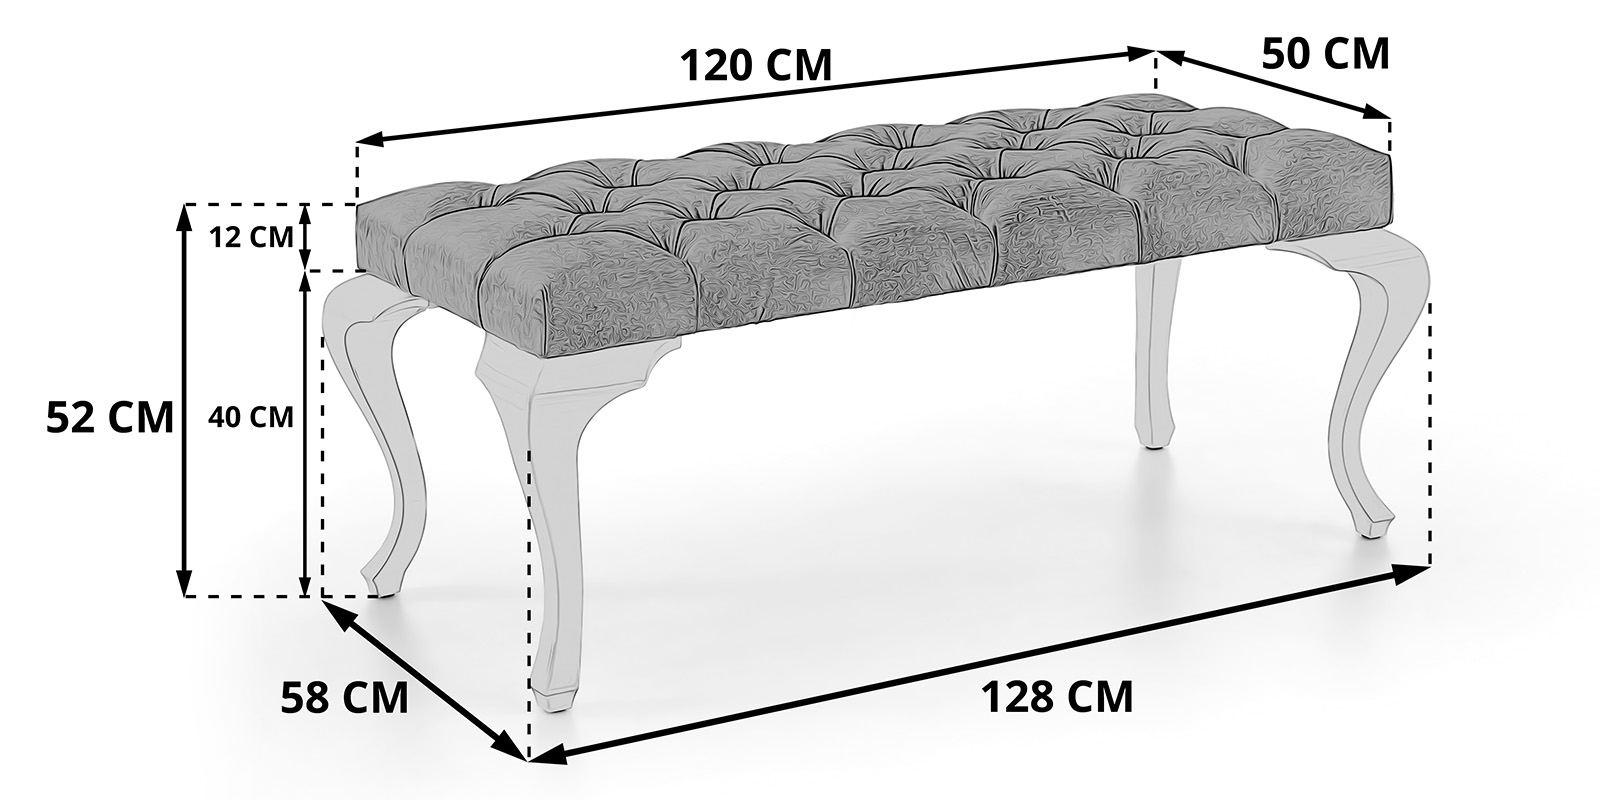 Sitzbank Schlafzimmer Barock Skizze